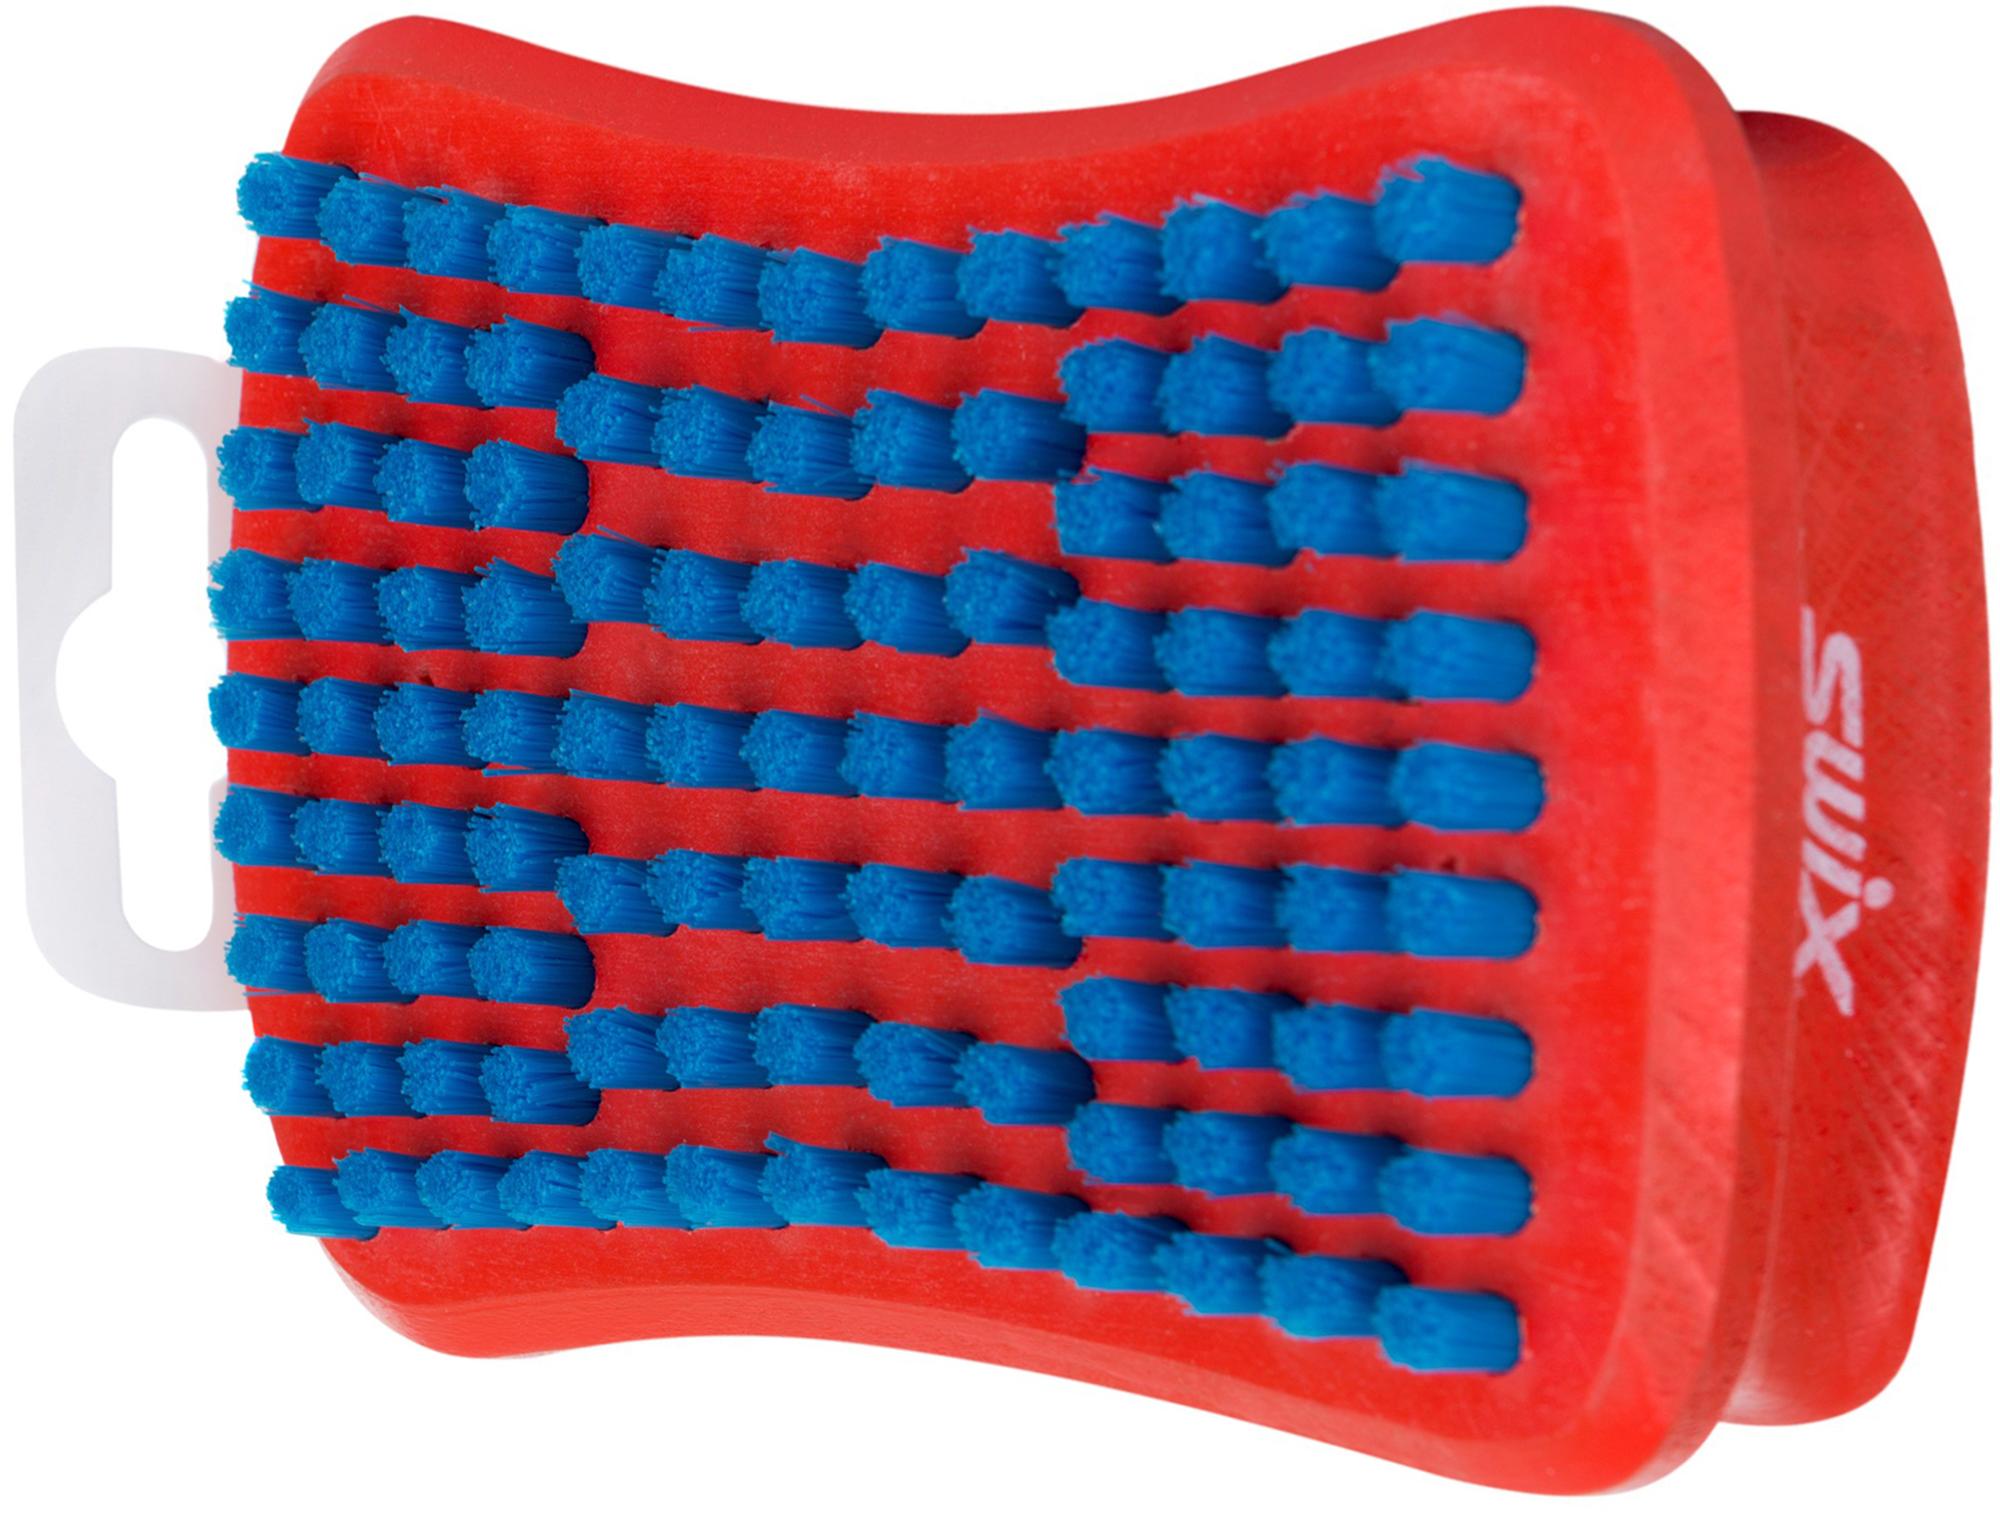 Swix Комби Turbo: пробка с щеткой Swix мазь твердая swix v0060 swix красный 45гр